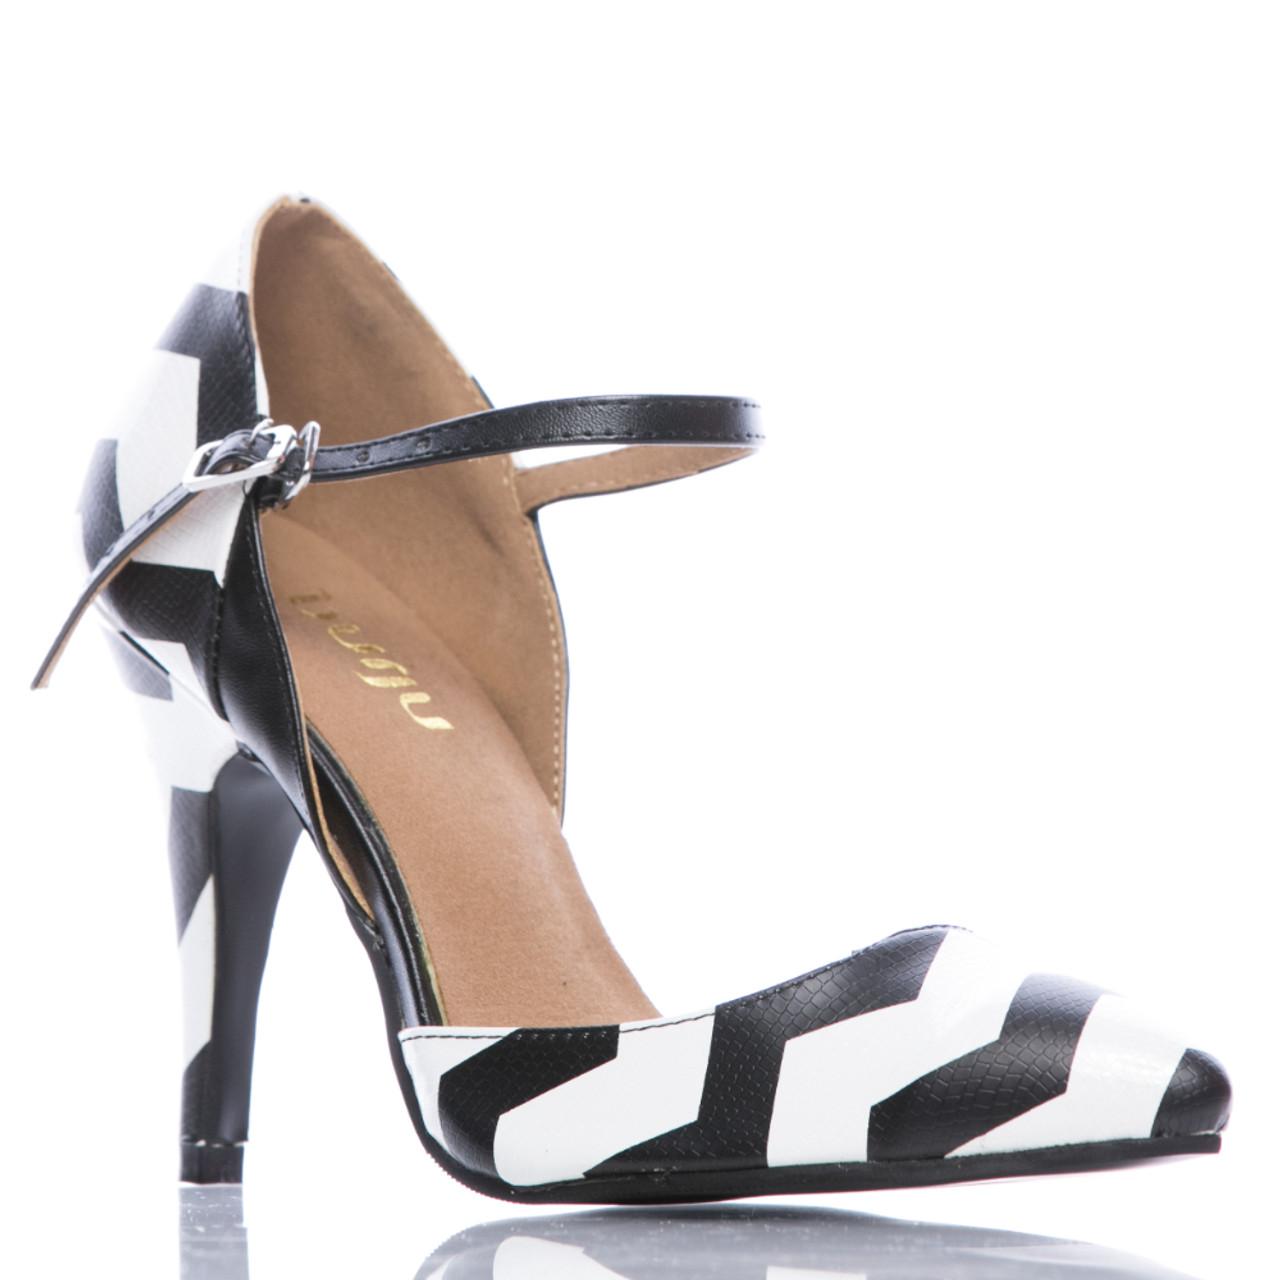 755df6d85fe Charlotte - Black and White Closed Toe Stiletto Pump - 4 inch Heels - Burju  Shoes